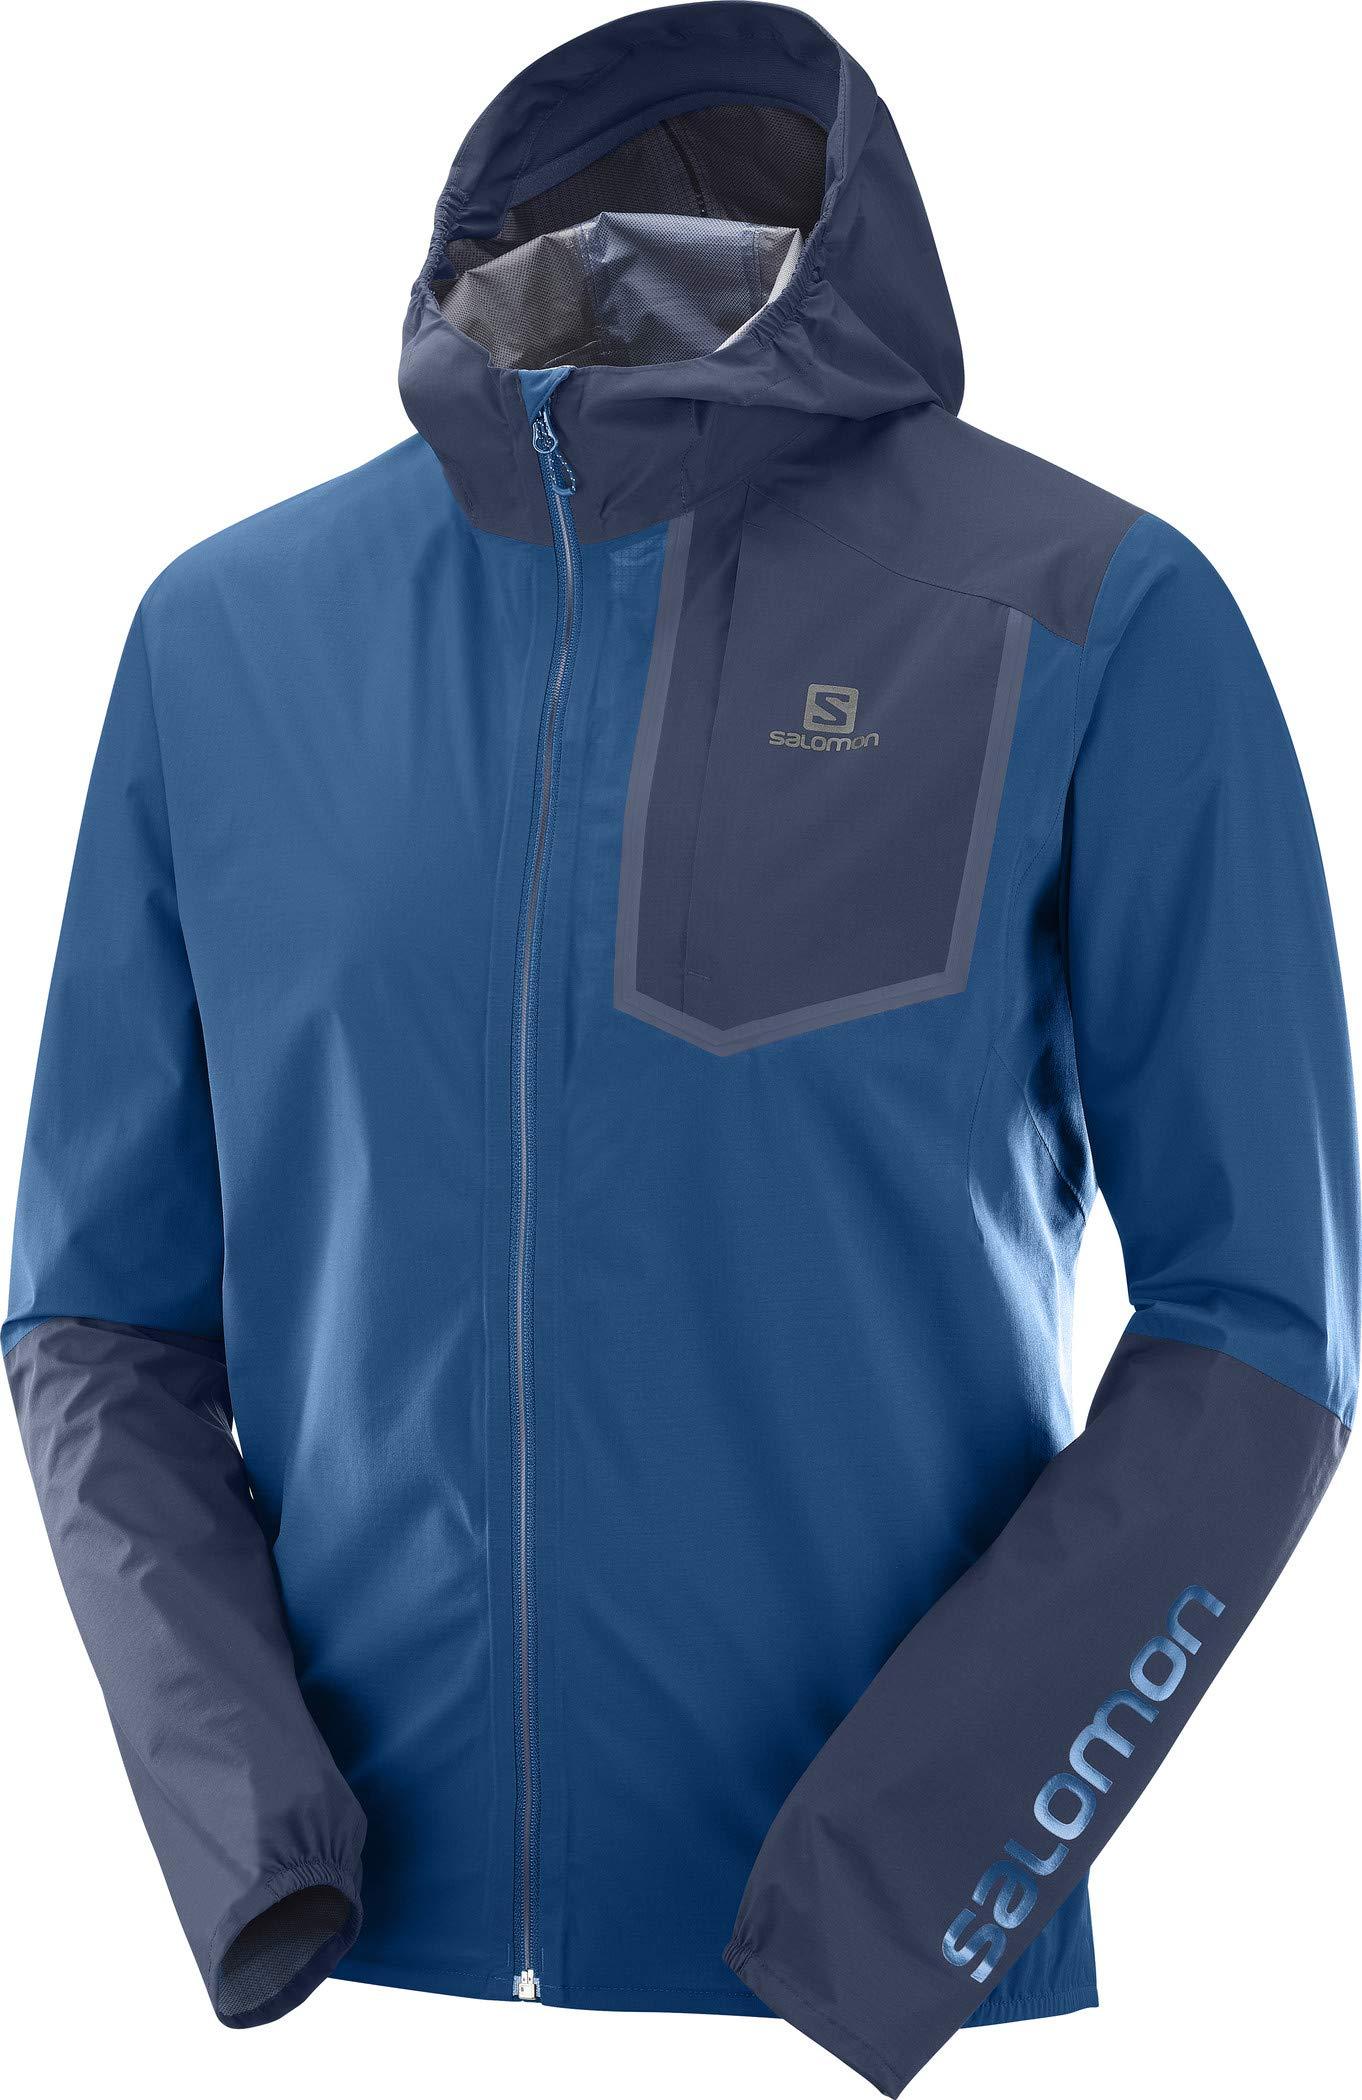 Salomon Men's Bonatti Pro WP Jacket, Poseidon/Night Sky, Medium